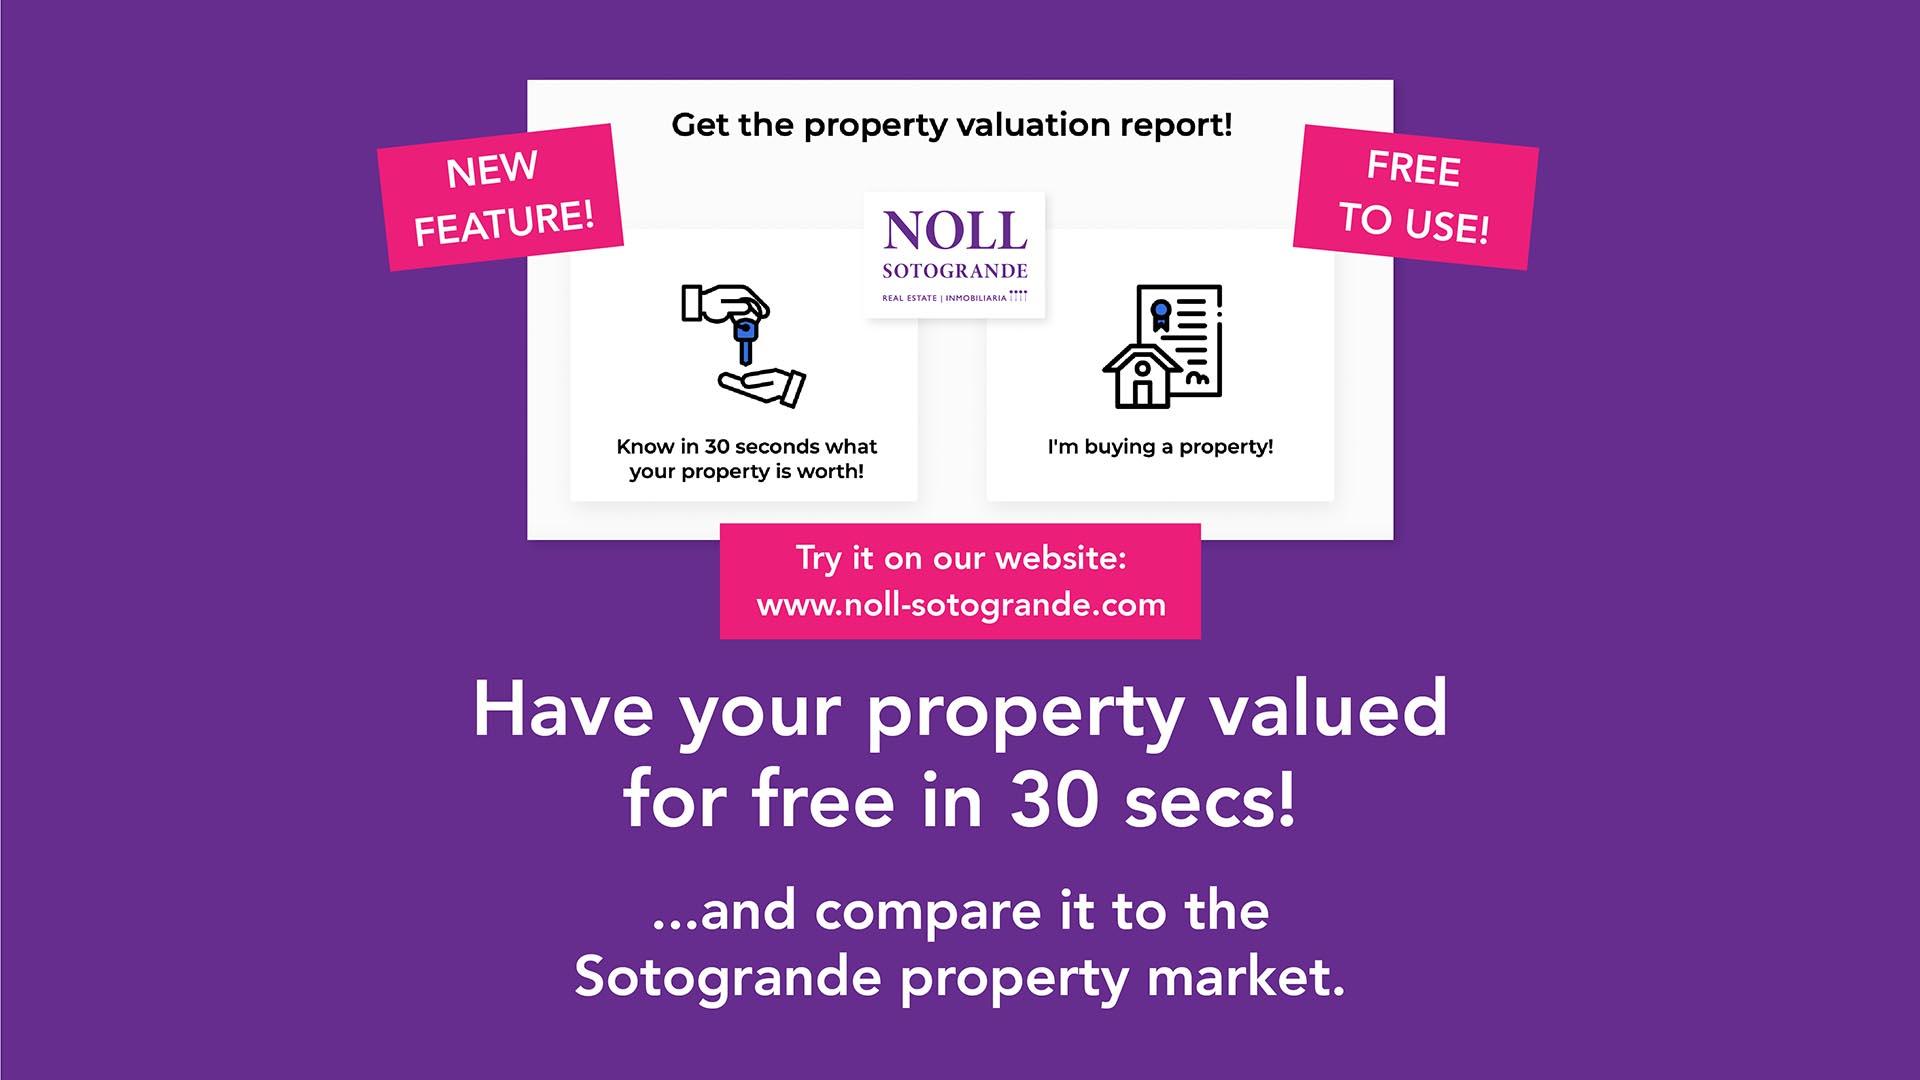 sotogrande home prices market - Have your property valued for free - noll sotogrande real estate-1